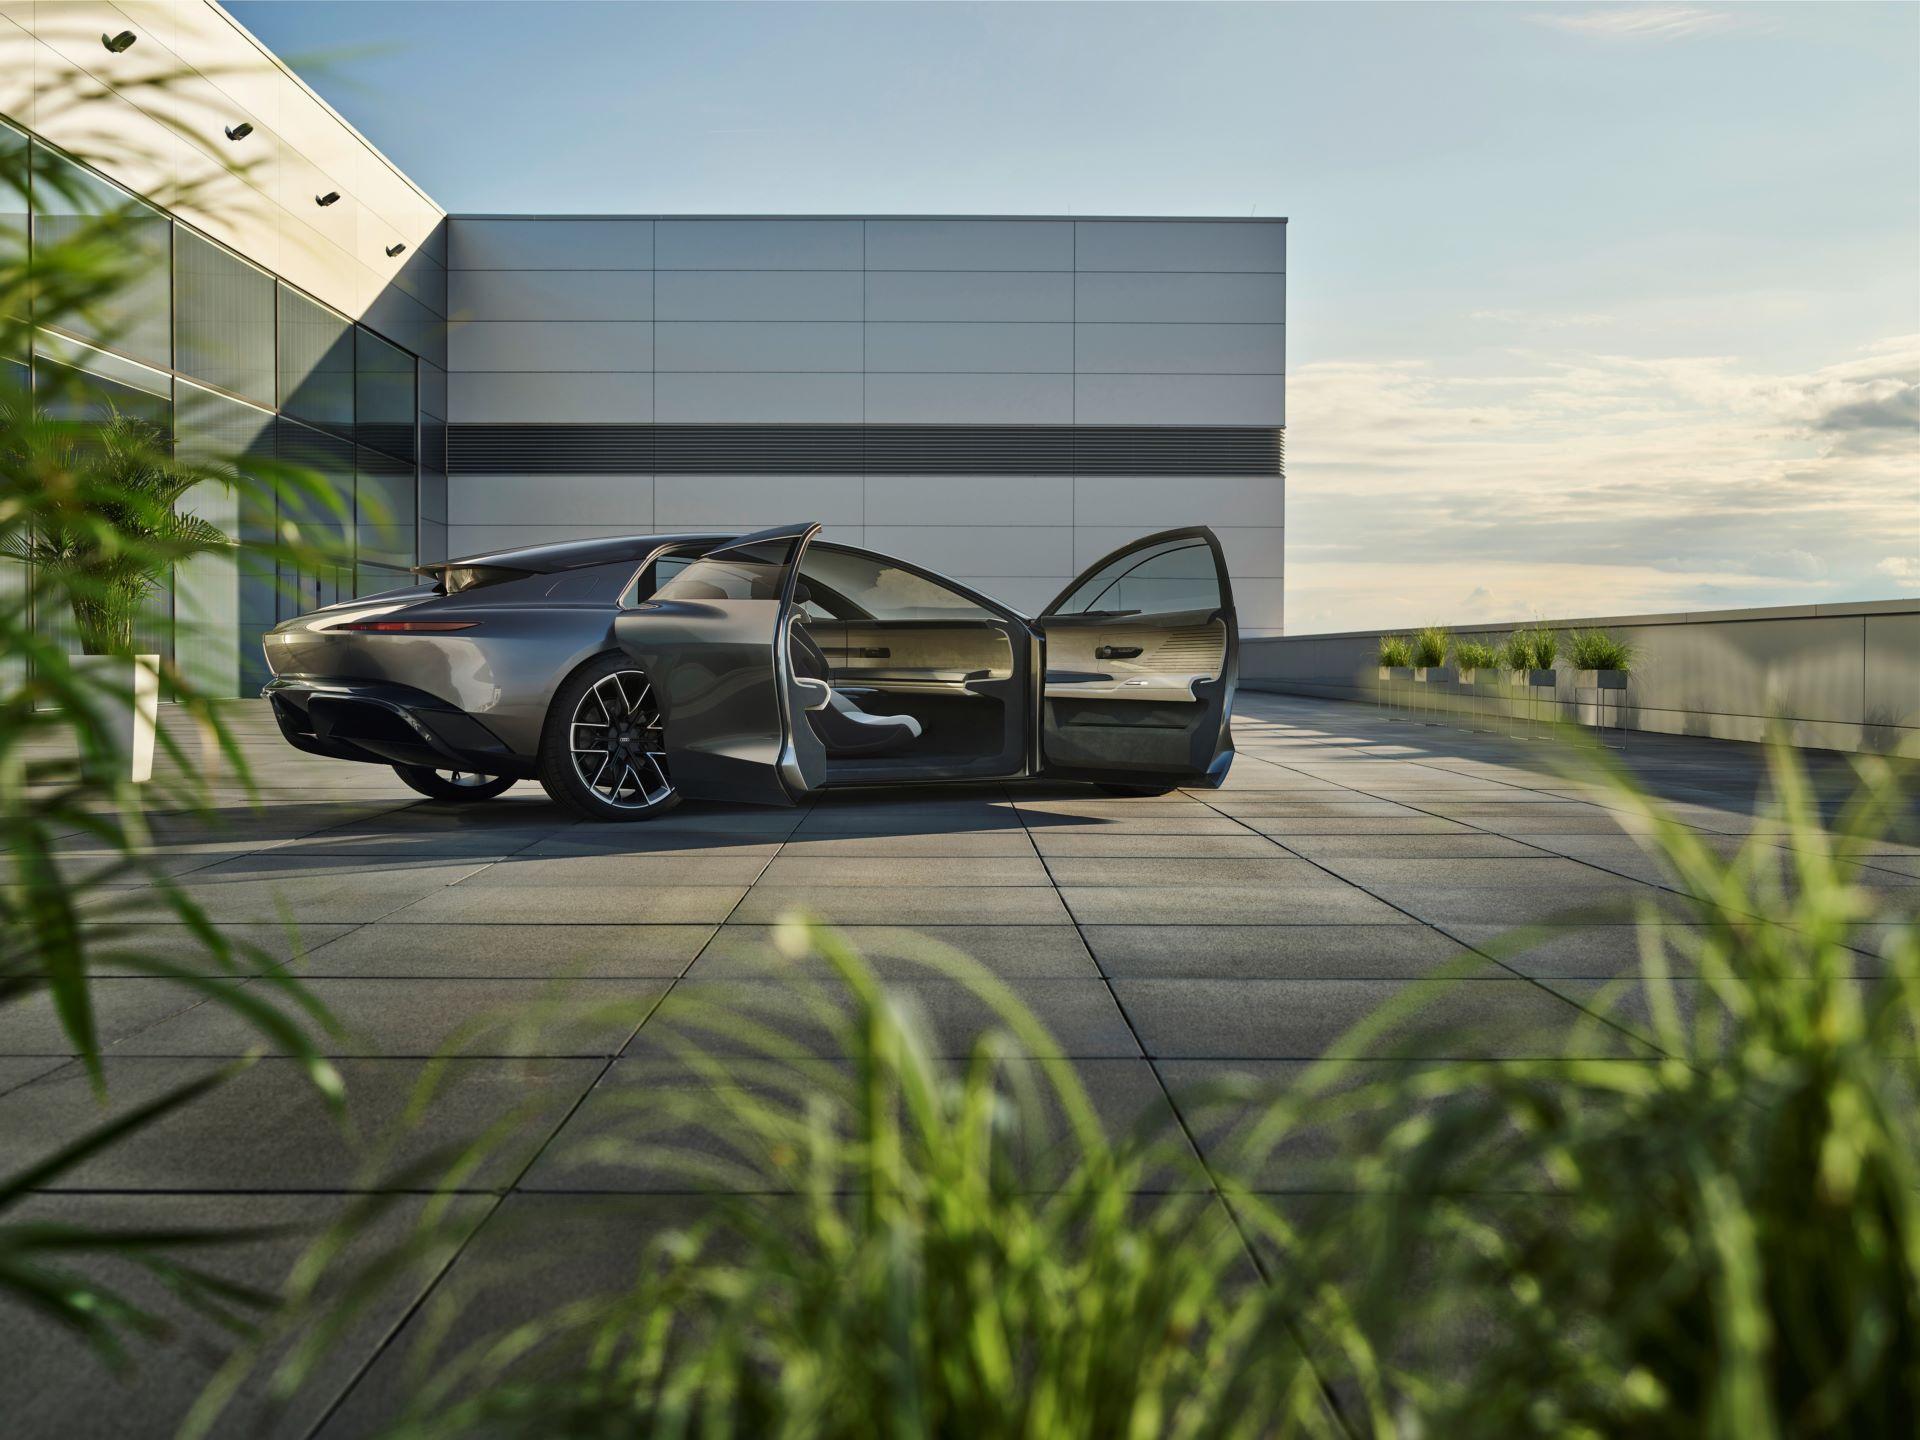 Audi-GrandSphere-concept-4